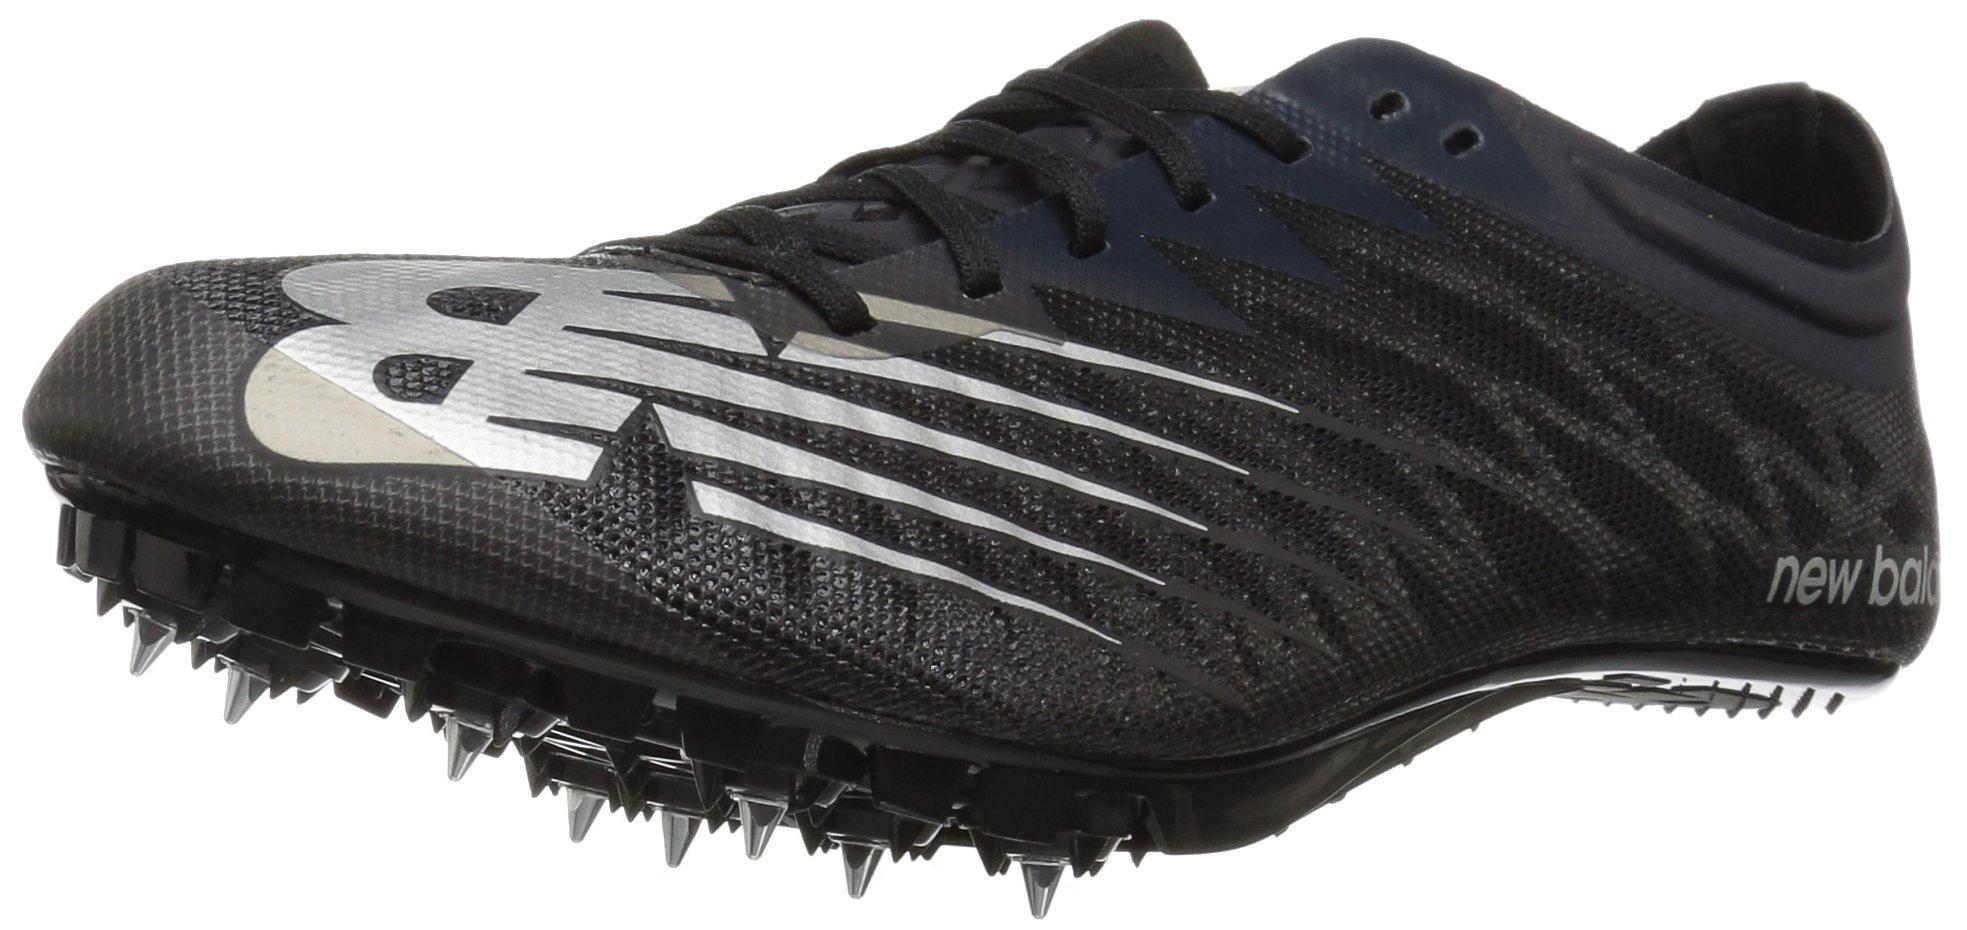 New Balance Men's Vazee Verge v1 Track Shoe, Black/Silver, 9.5 D US by New Balance